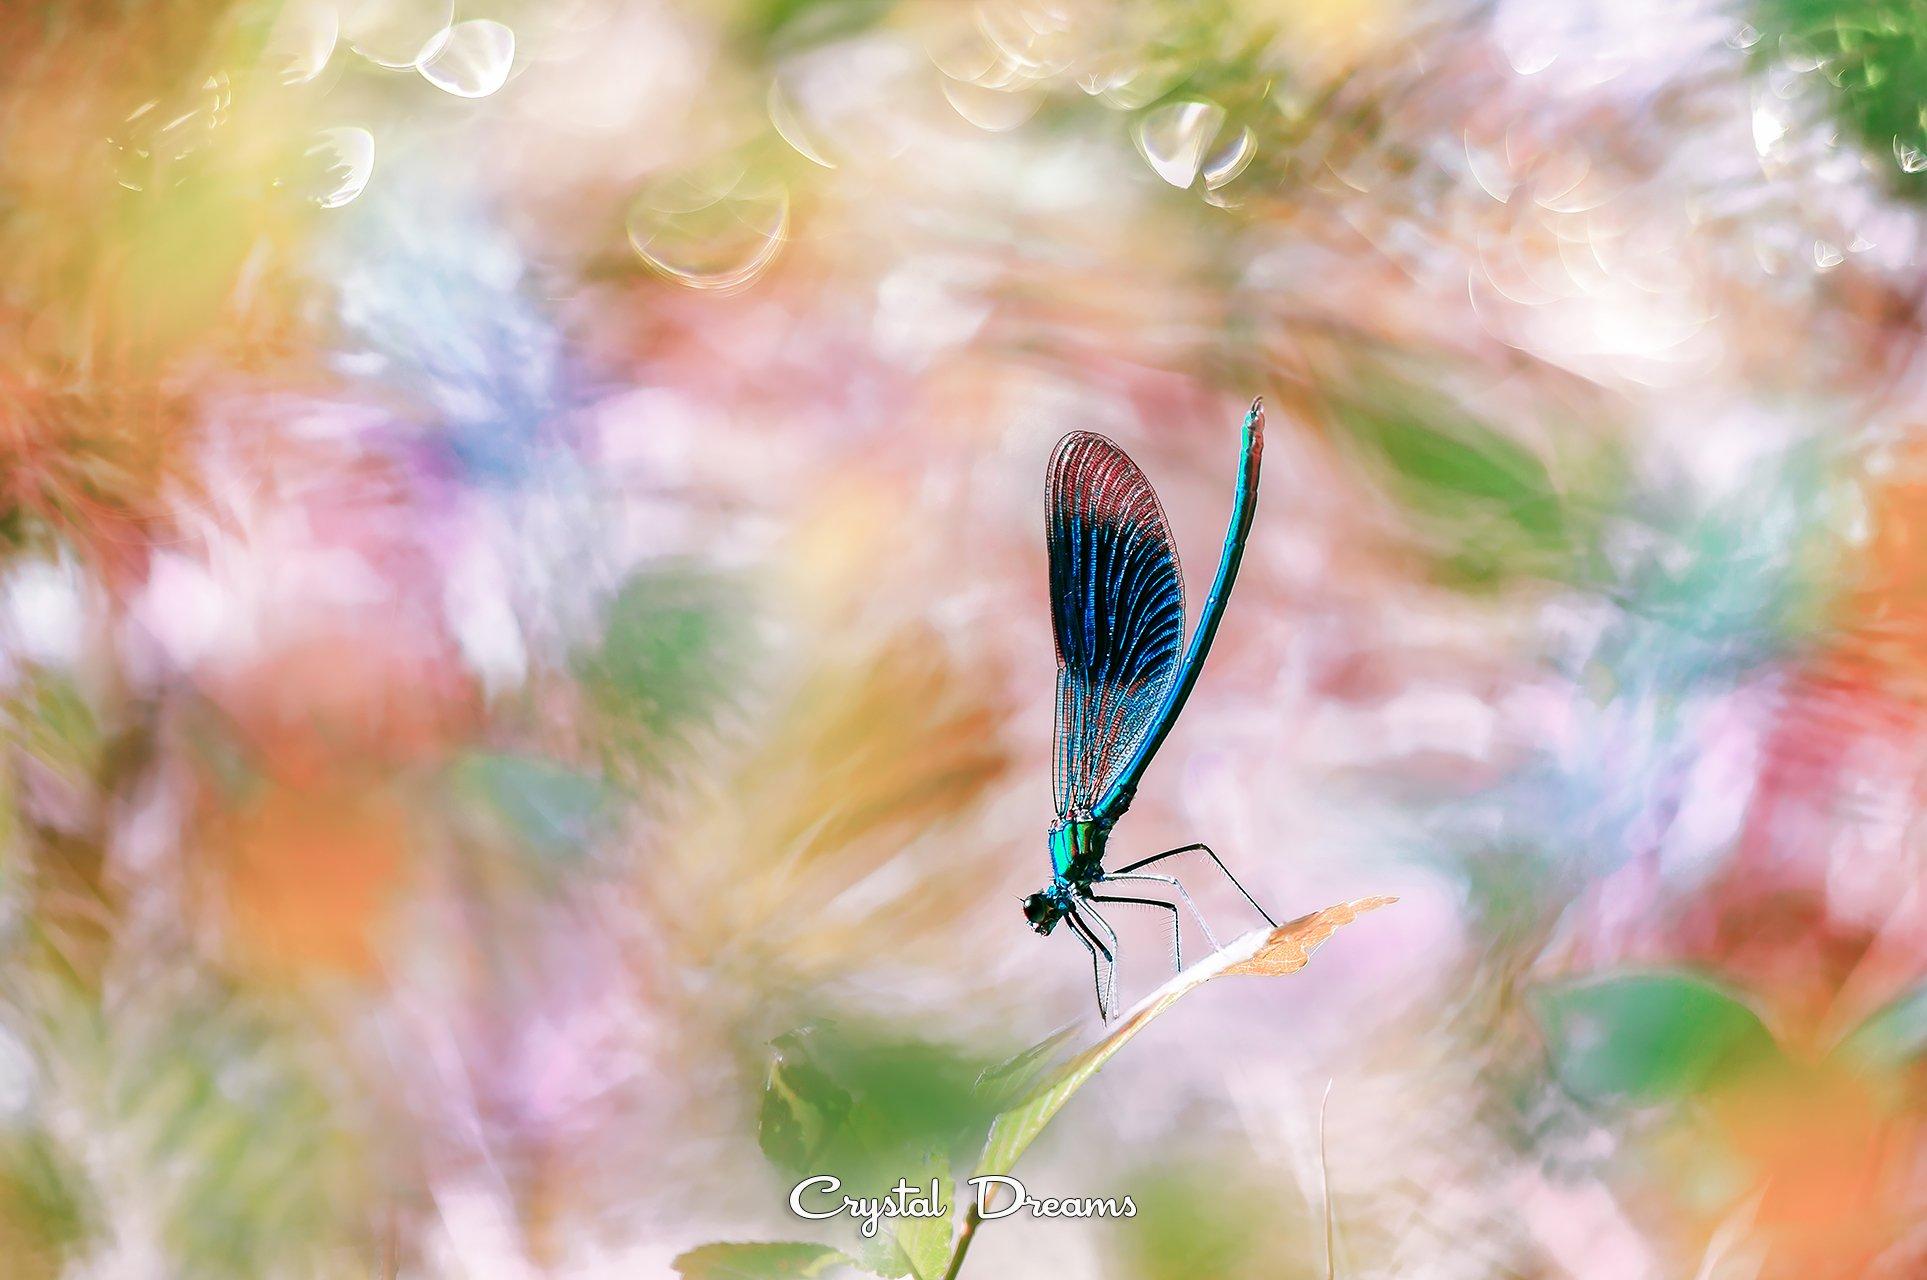 crystal dreams, macro, summer, color, art, nature, dragonfly, Крылова Татьяна